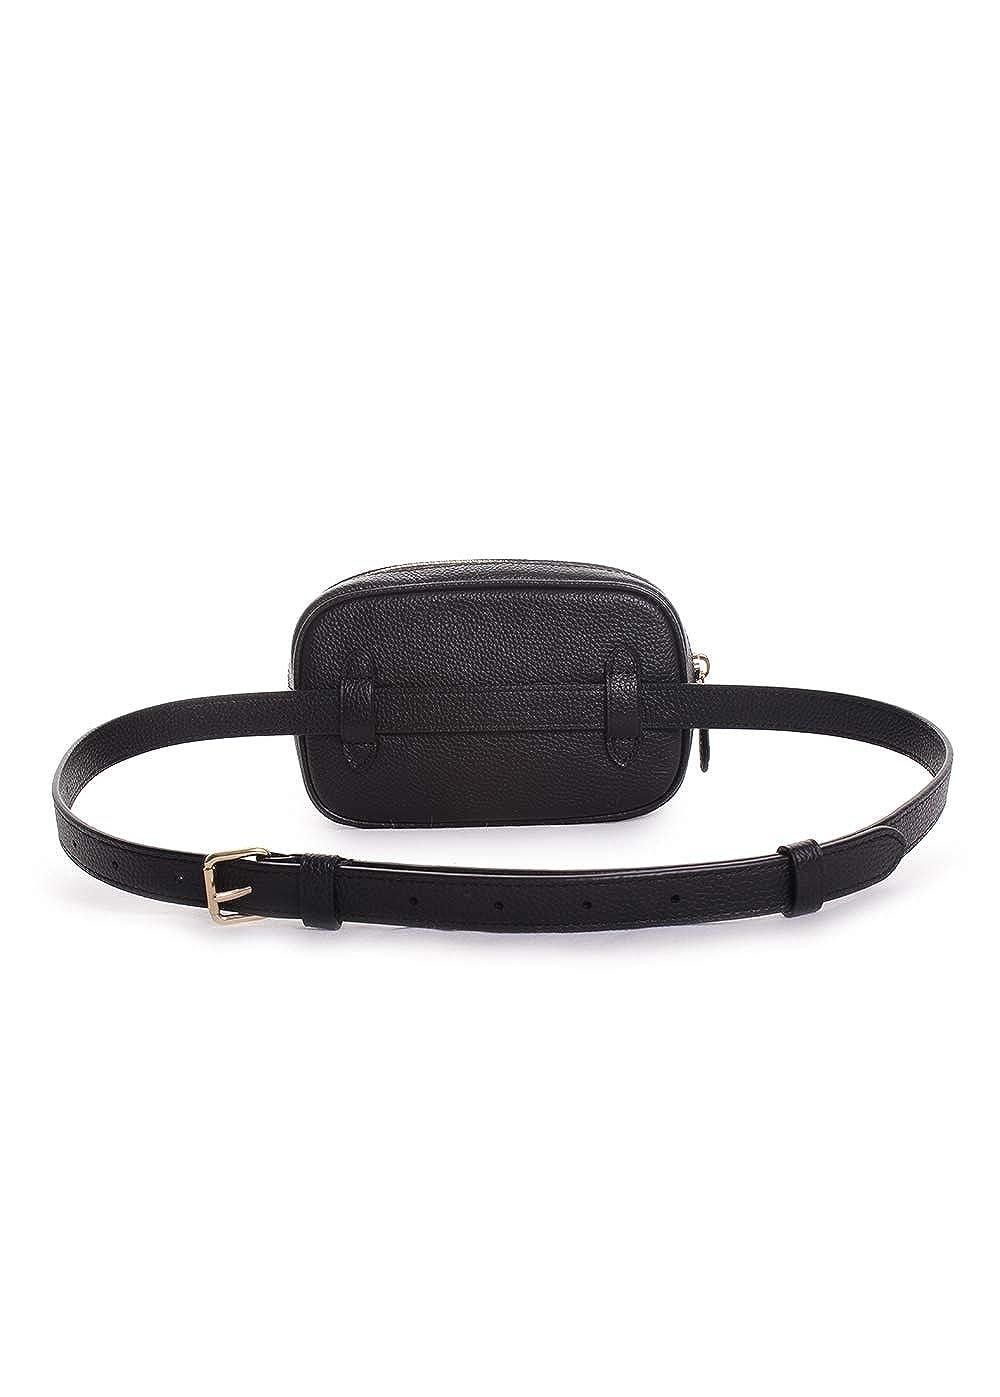 b1b0ea05522d Amazon.com  COACH Women s Polished Pebble Dressy Belt Bag Black Gold One  Size  Clothing